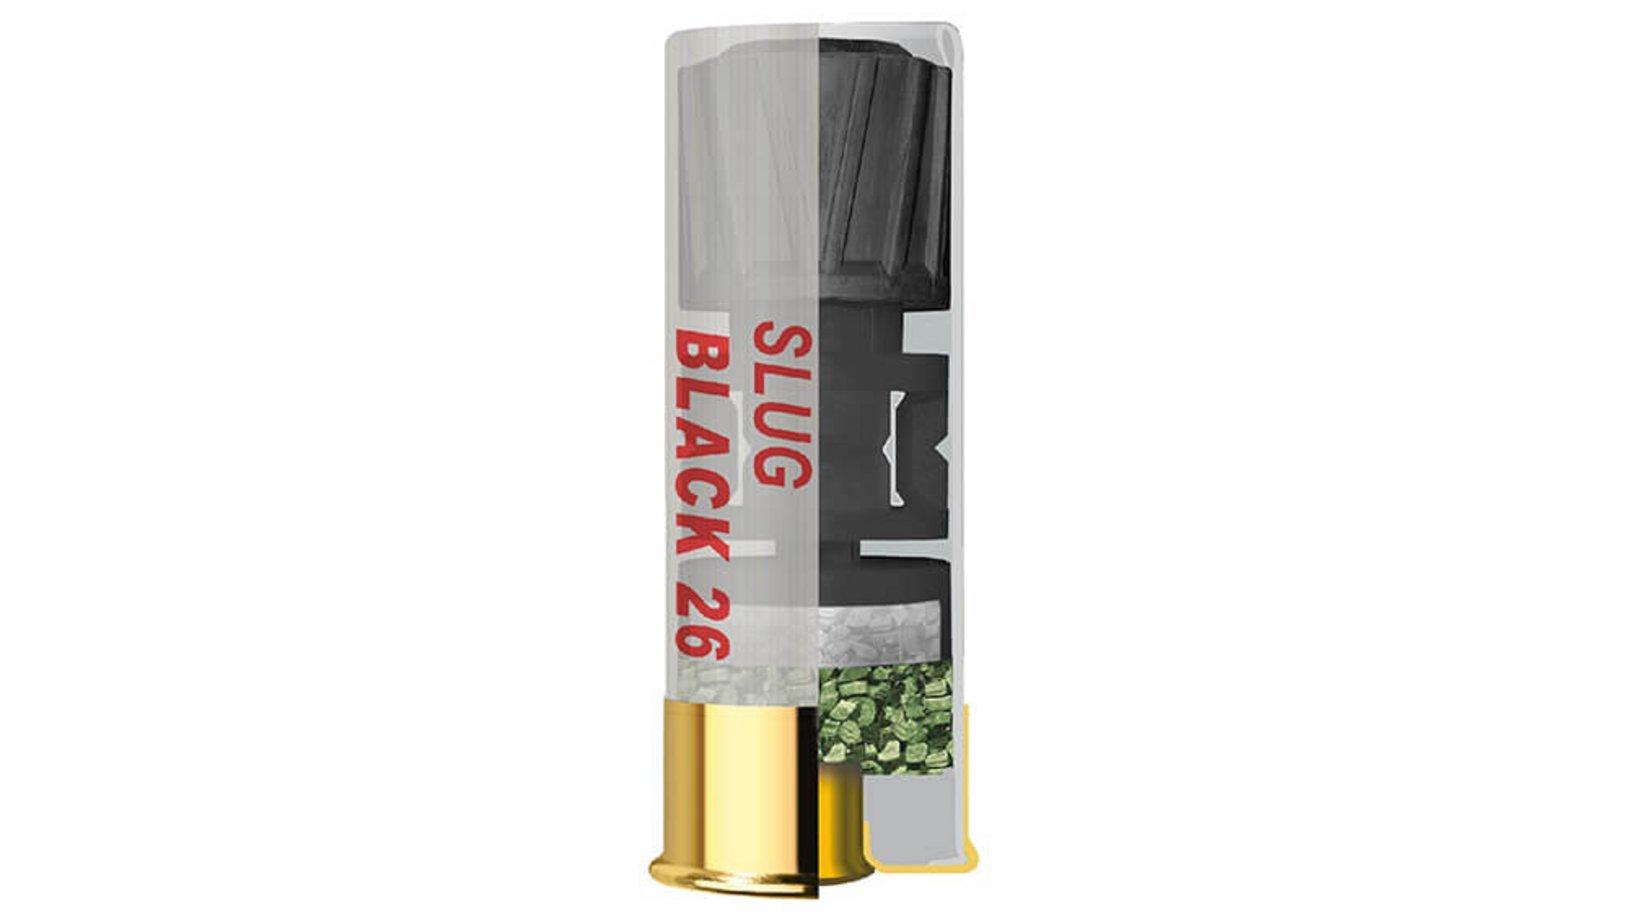 Frontview of ammunition of GECO Coated Competition Slug Black 26 12/67,5